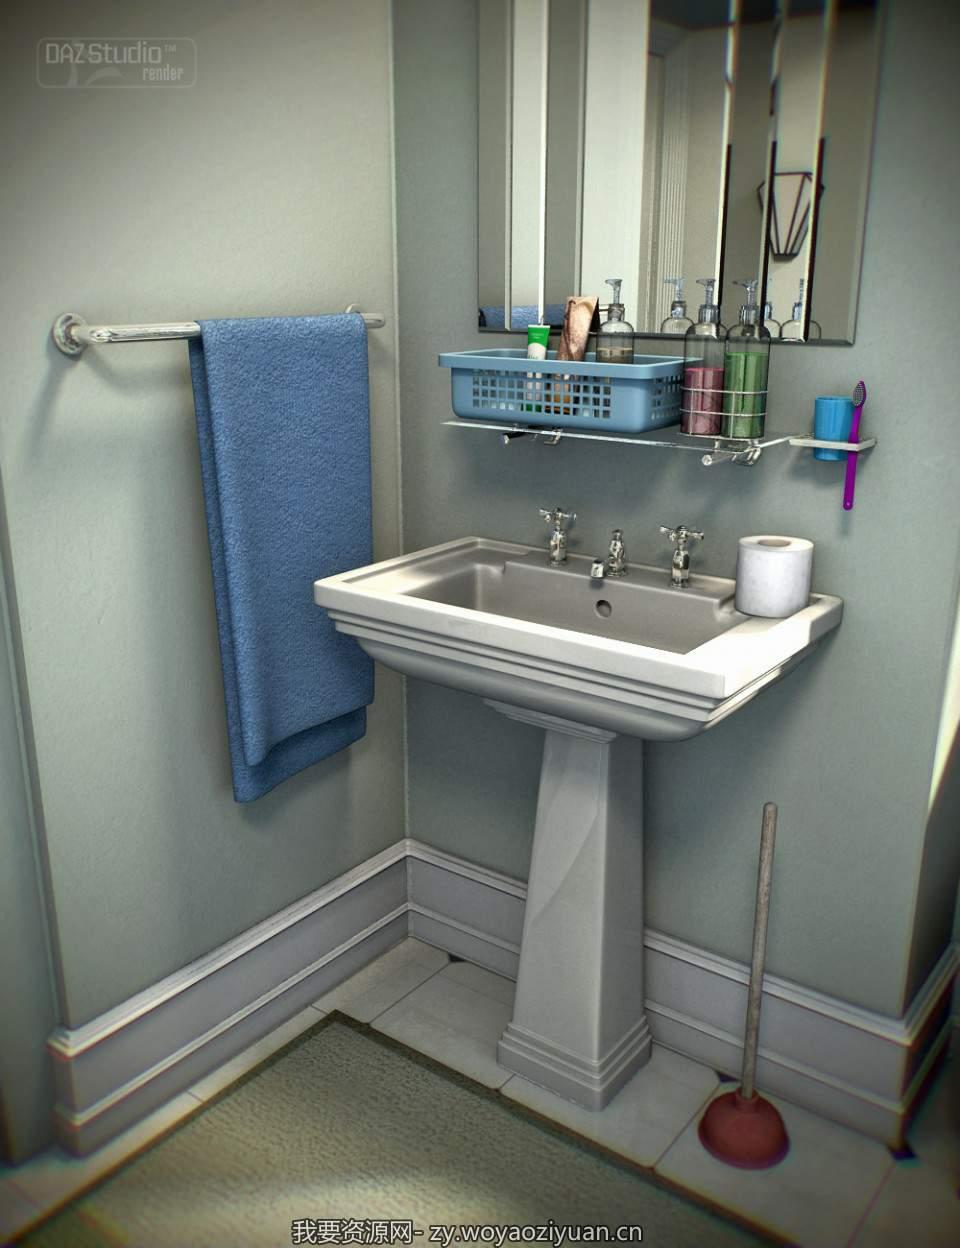 Collective3d Bathroom Stuff